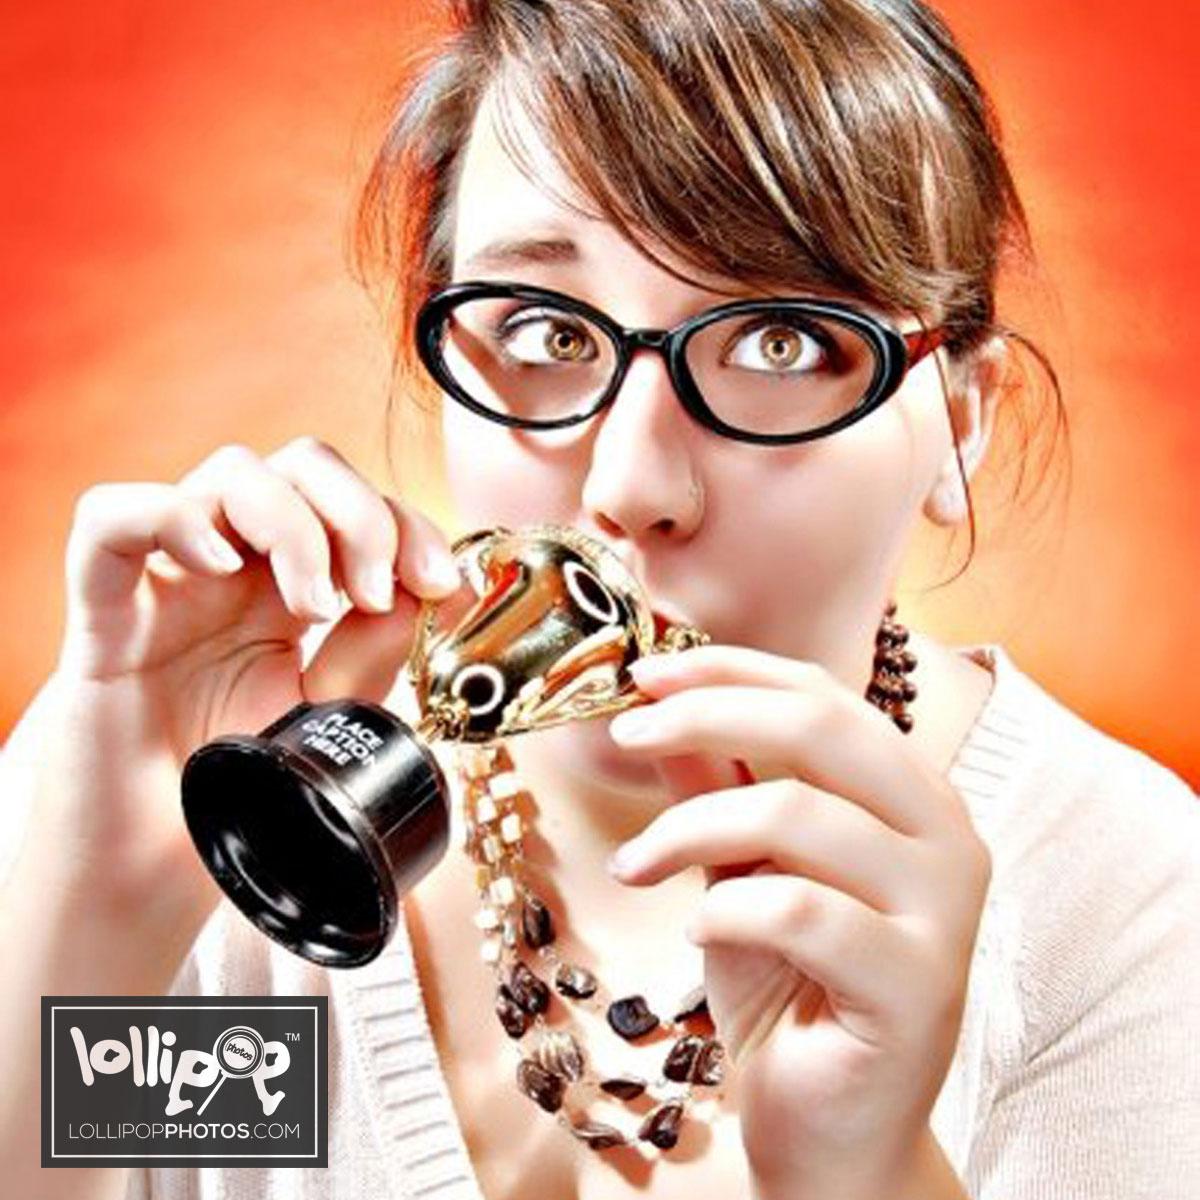 msdig-nora-canfield-lollipop-photos-125.jpg